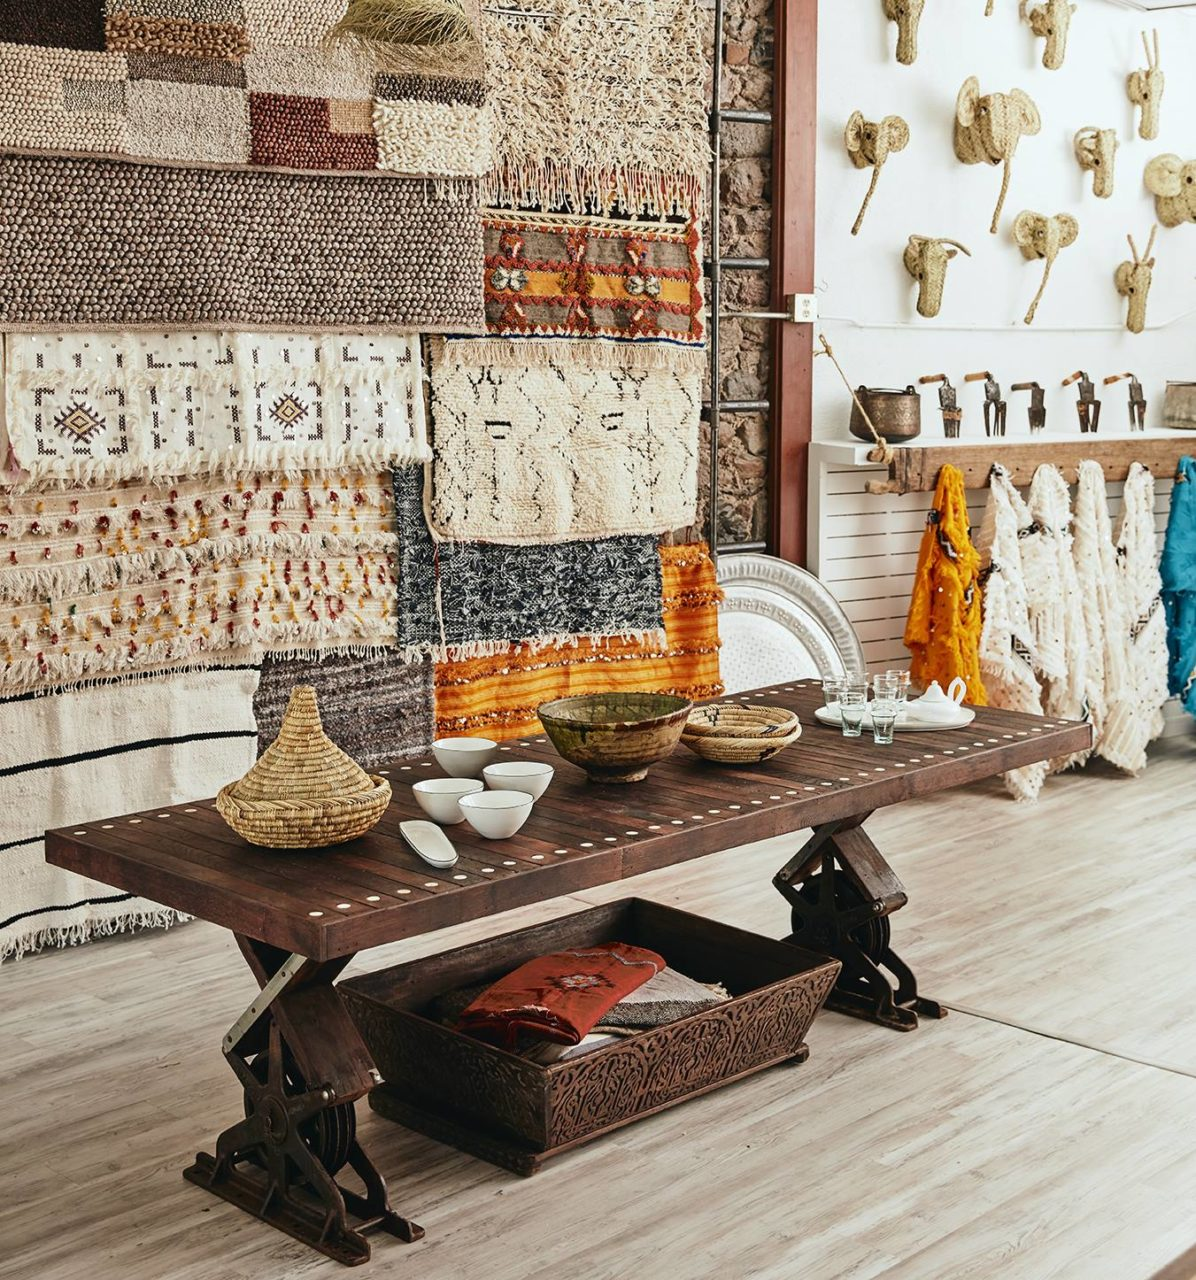 Trend Alert African Decor: Design Trend Alert: Moroccan-Style Furniture And Decor